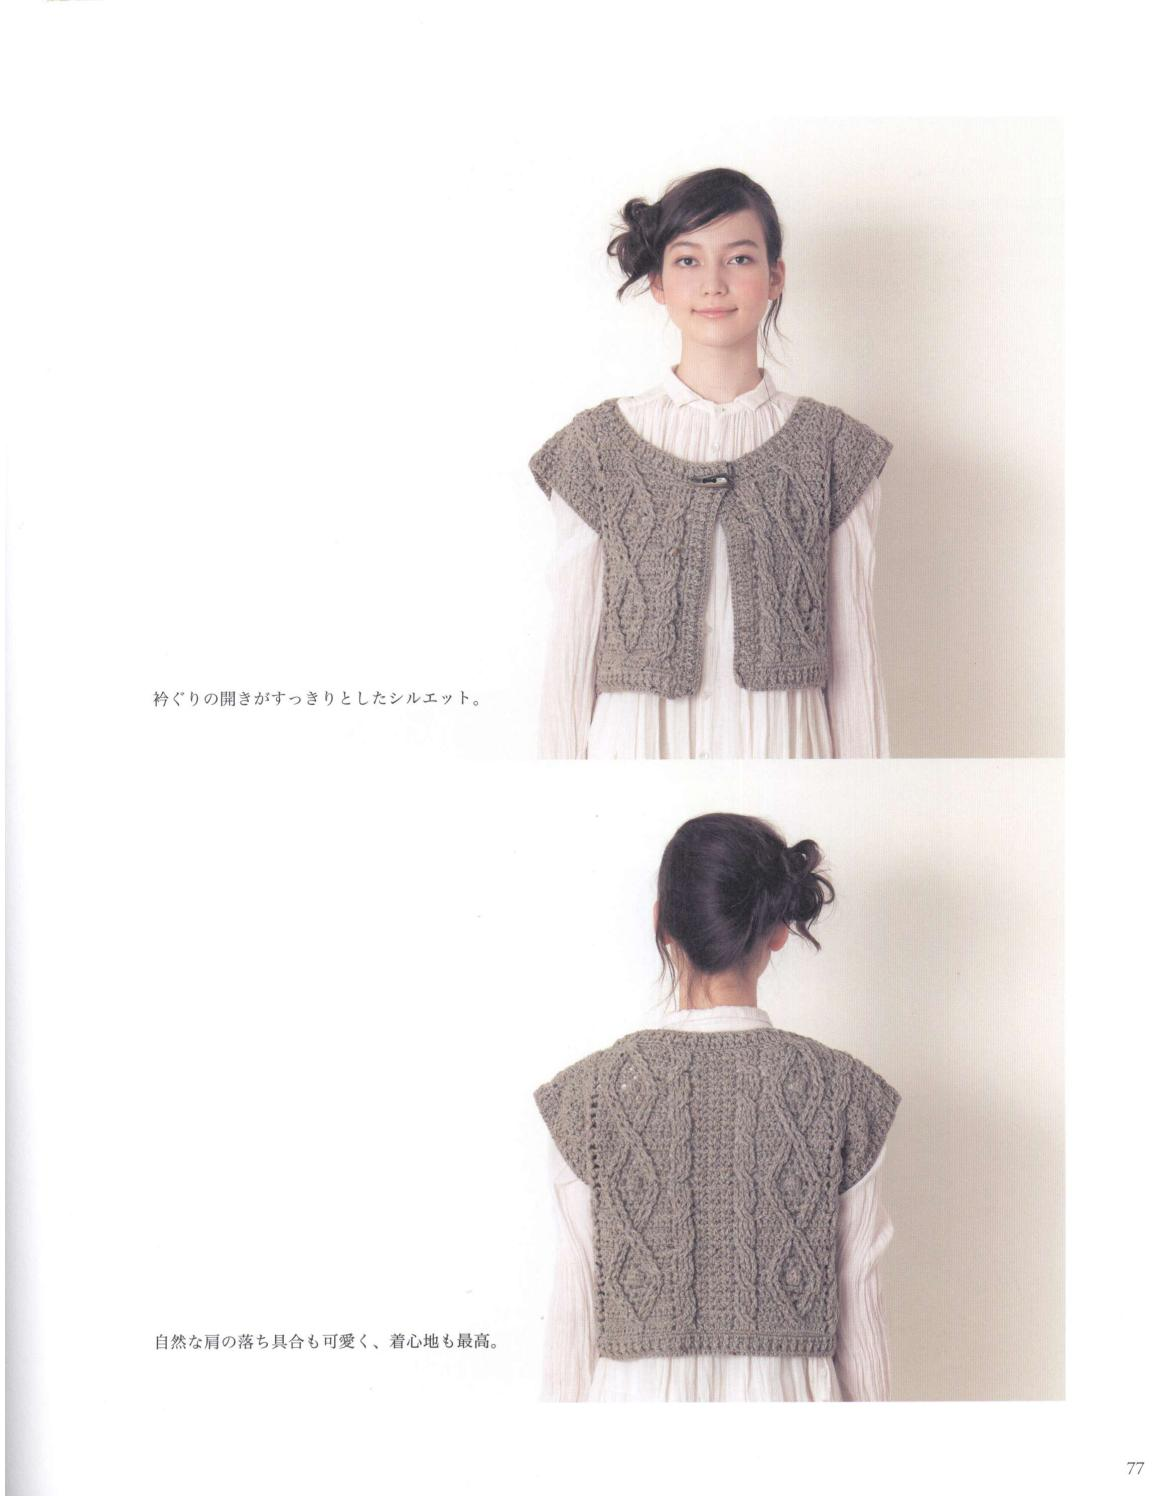 Asahi original crochet best selection 2012 page 77